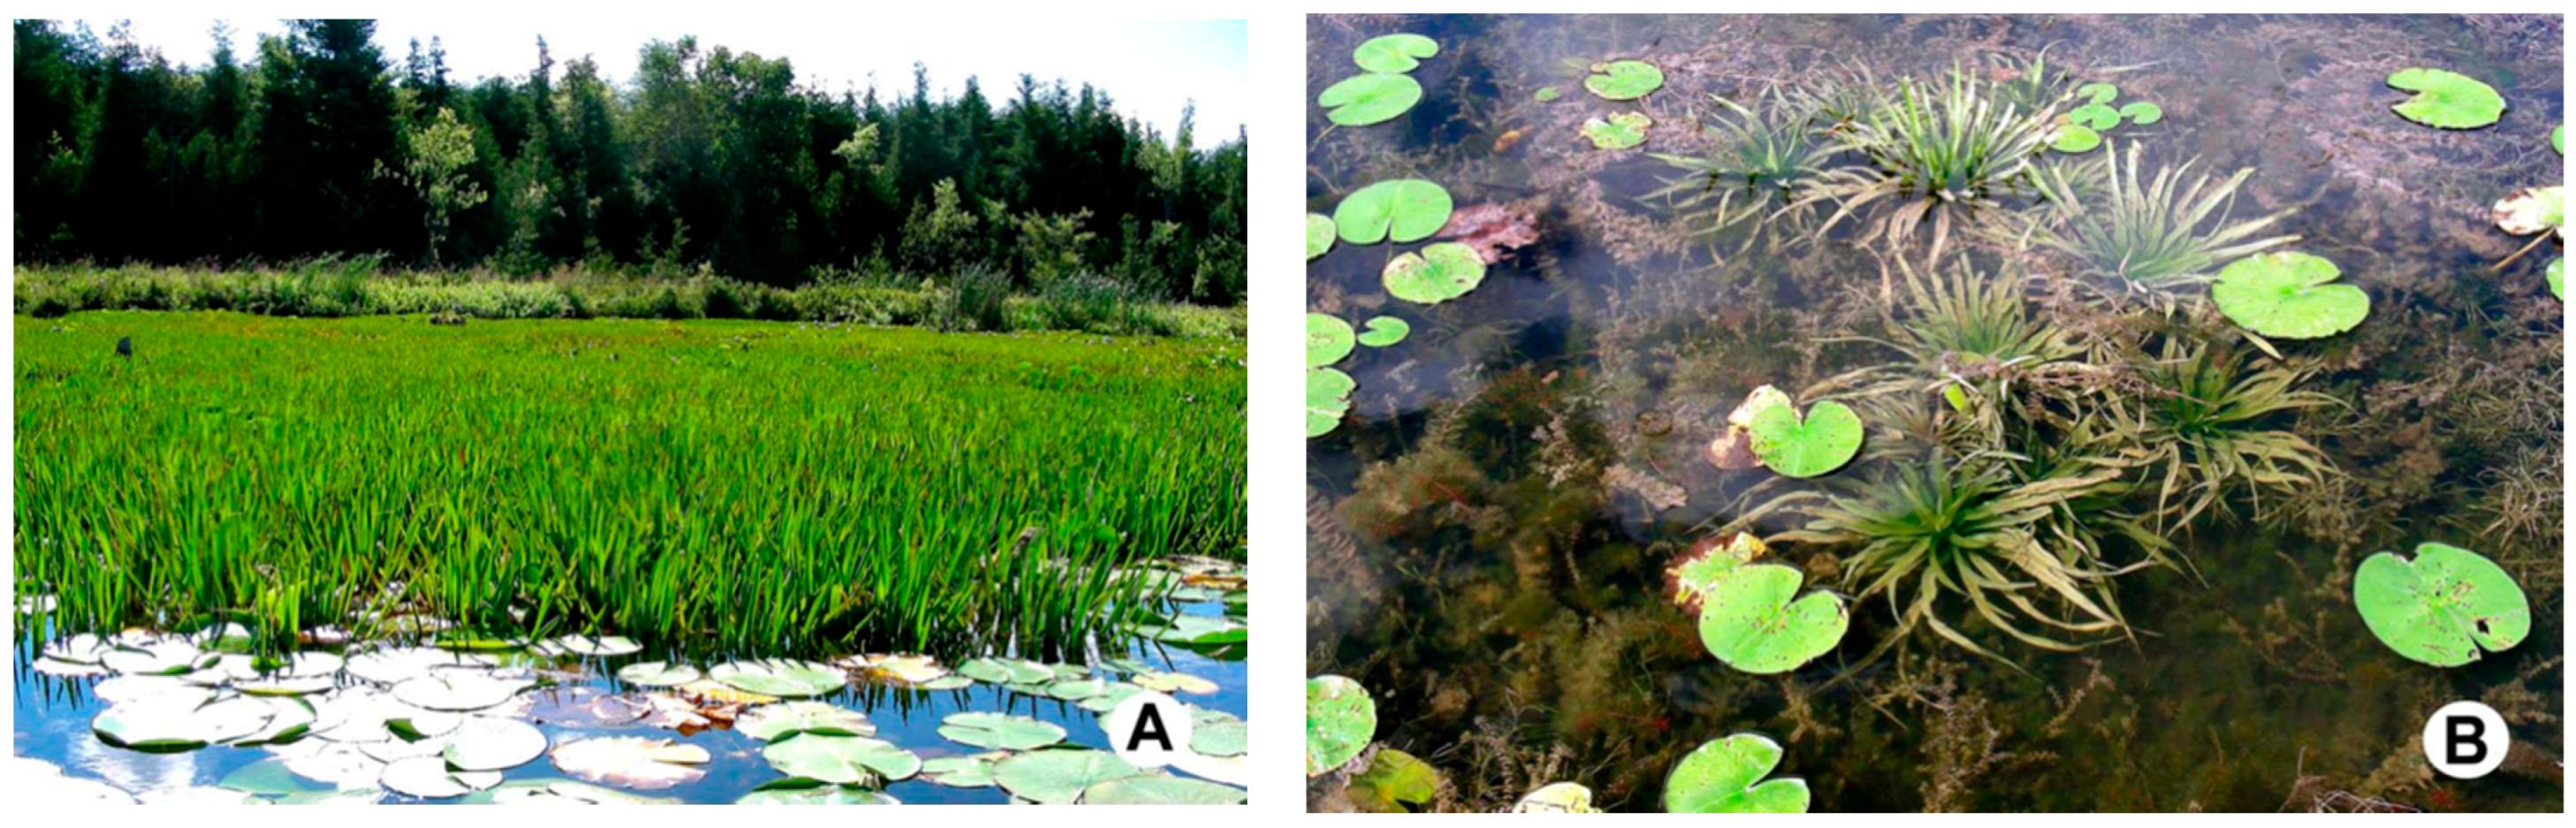 3 x Iris Ann Chowing Early Bird Season Deals Live Water Plant Aquatic Pond Lake Marginal